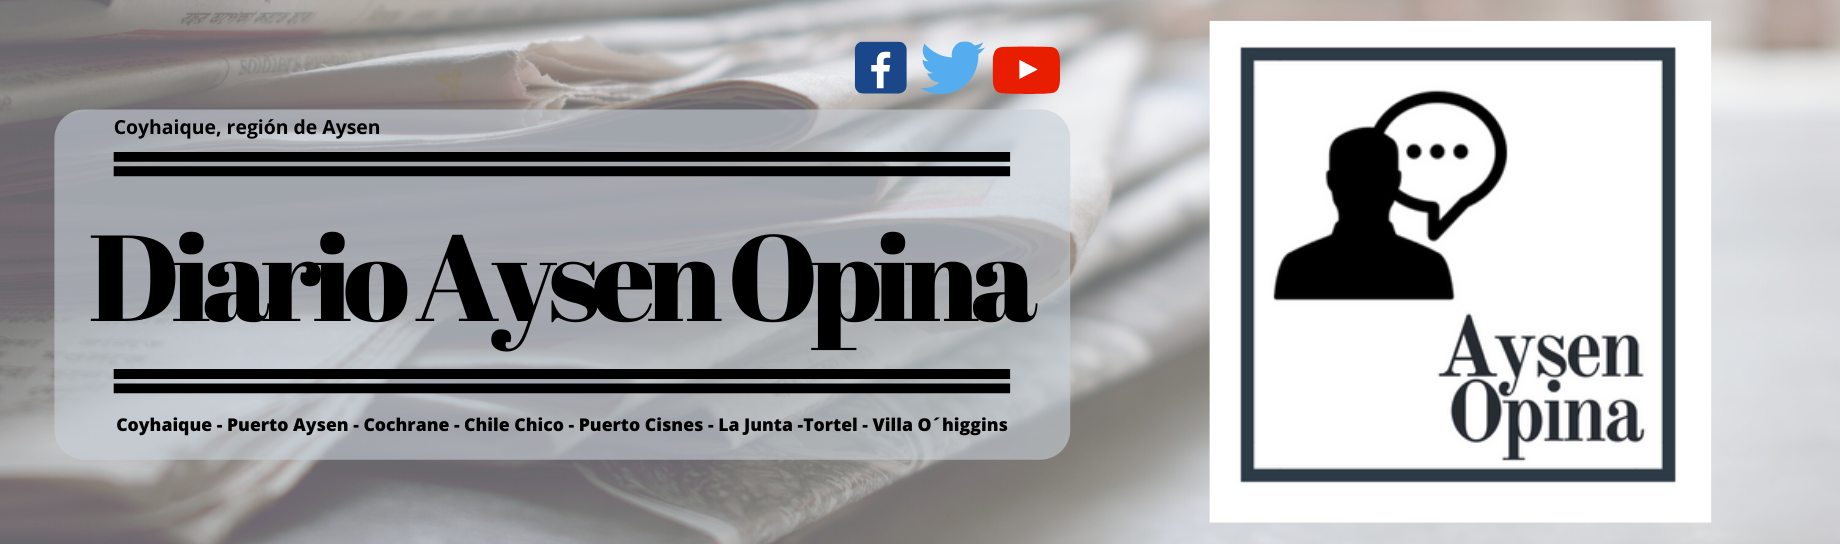 Diario Aysen Opina